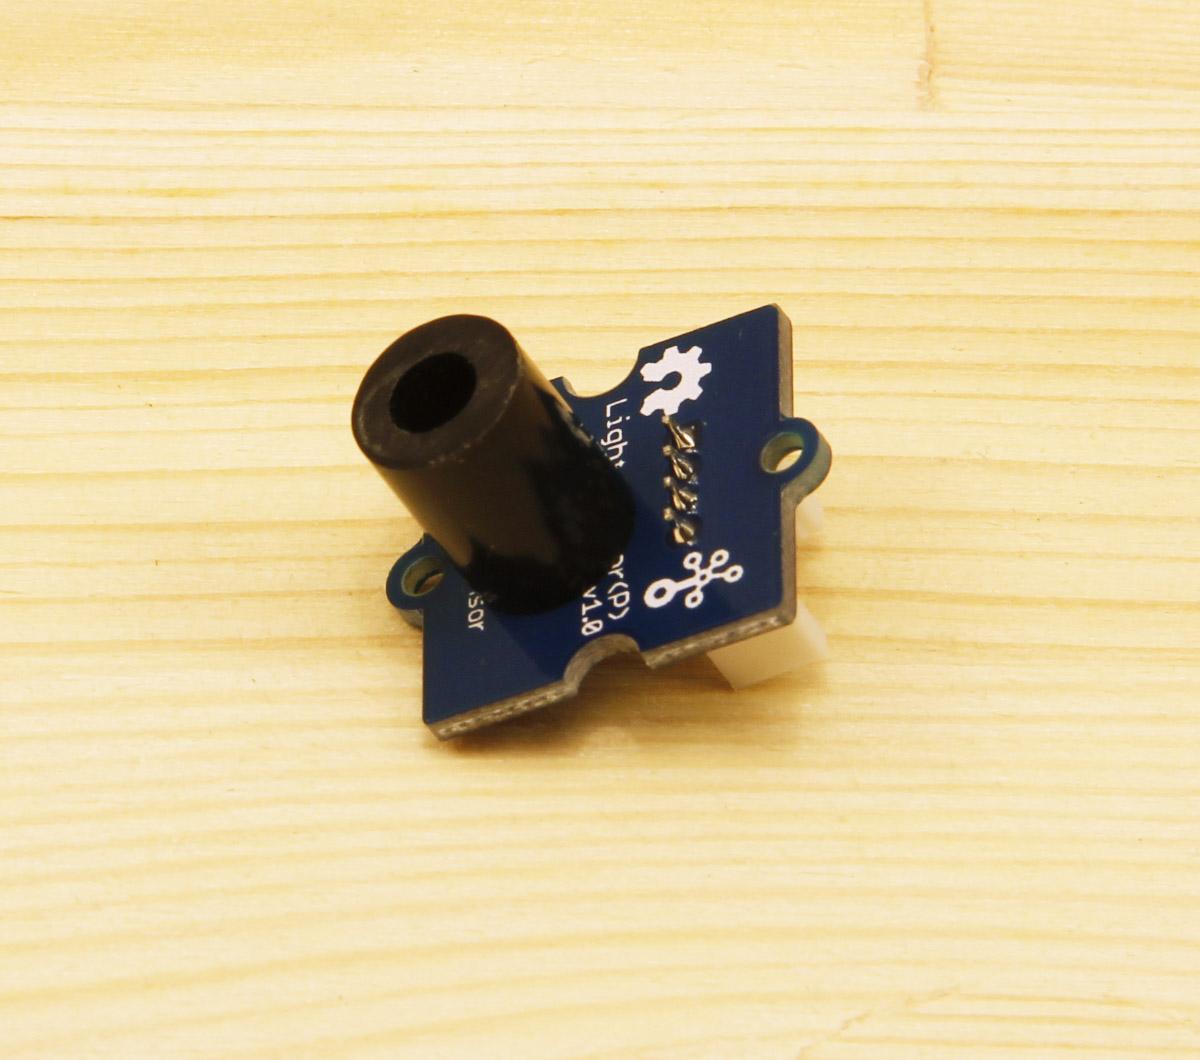 Place The Black Plastic Spacer On Light Sensor